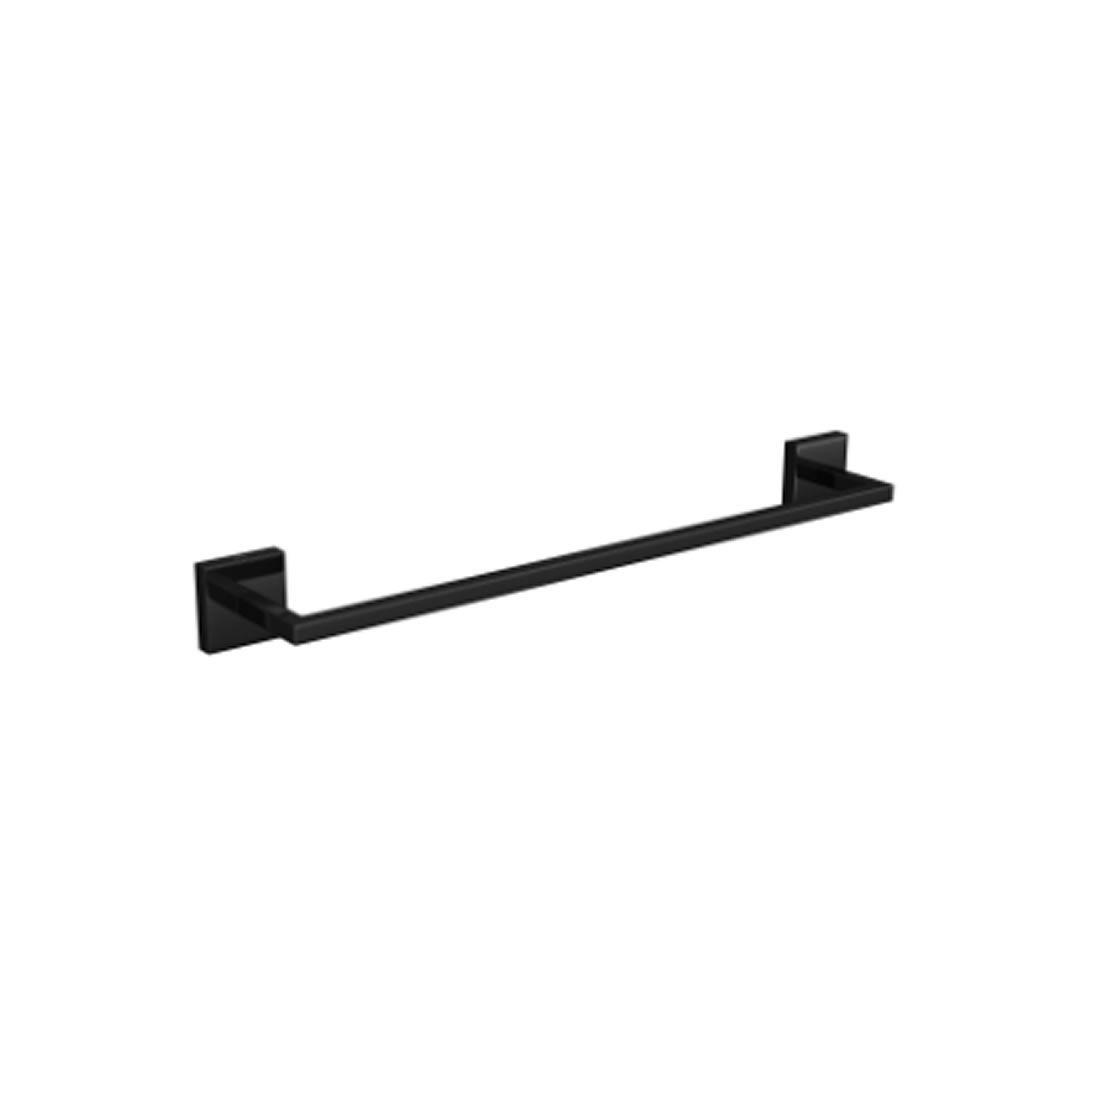 Porta Toalha Deca Clean 40 Cm Black Noir Ref 2040.BL.040.CLN.NO